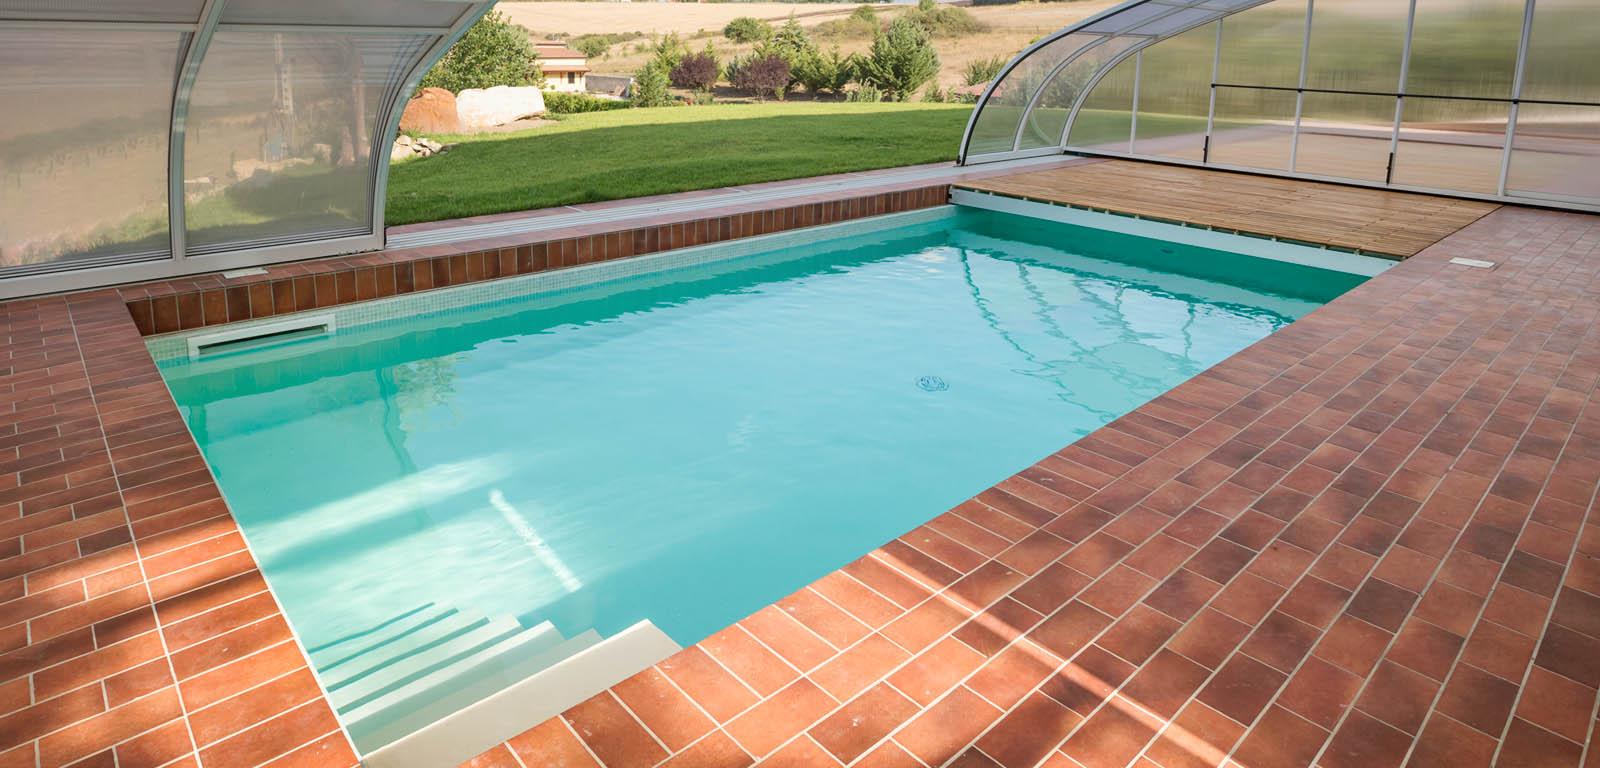 Vasche da esterno prezzi piscina fuori terra intex frame - Piscina interrata piccola ...